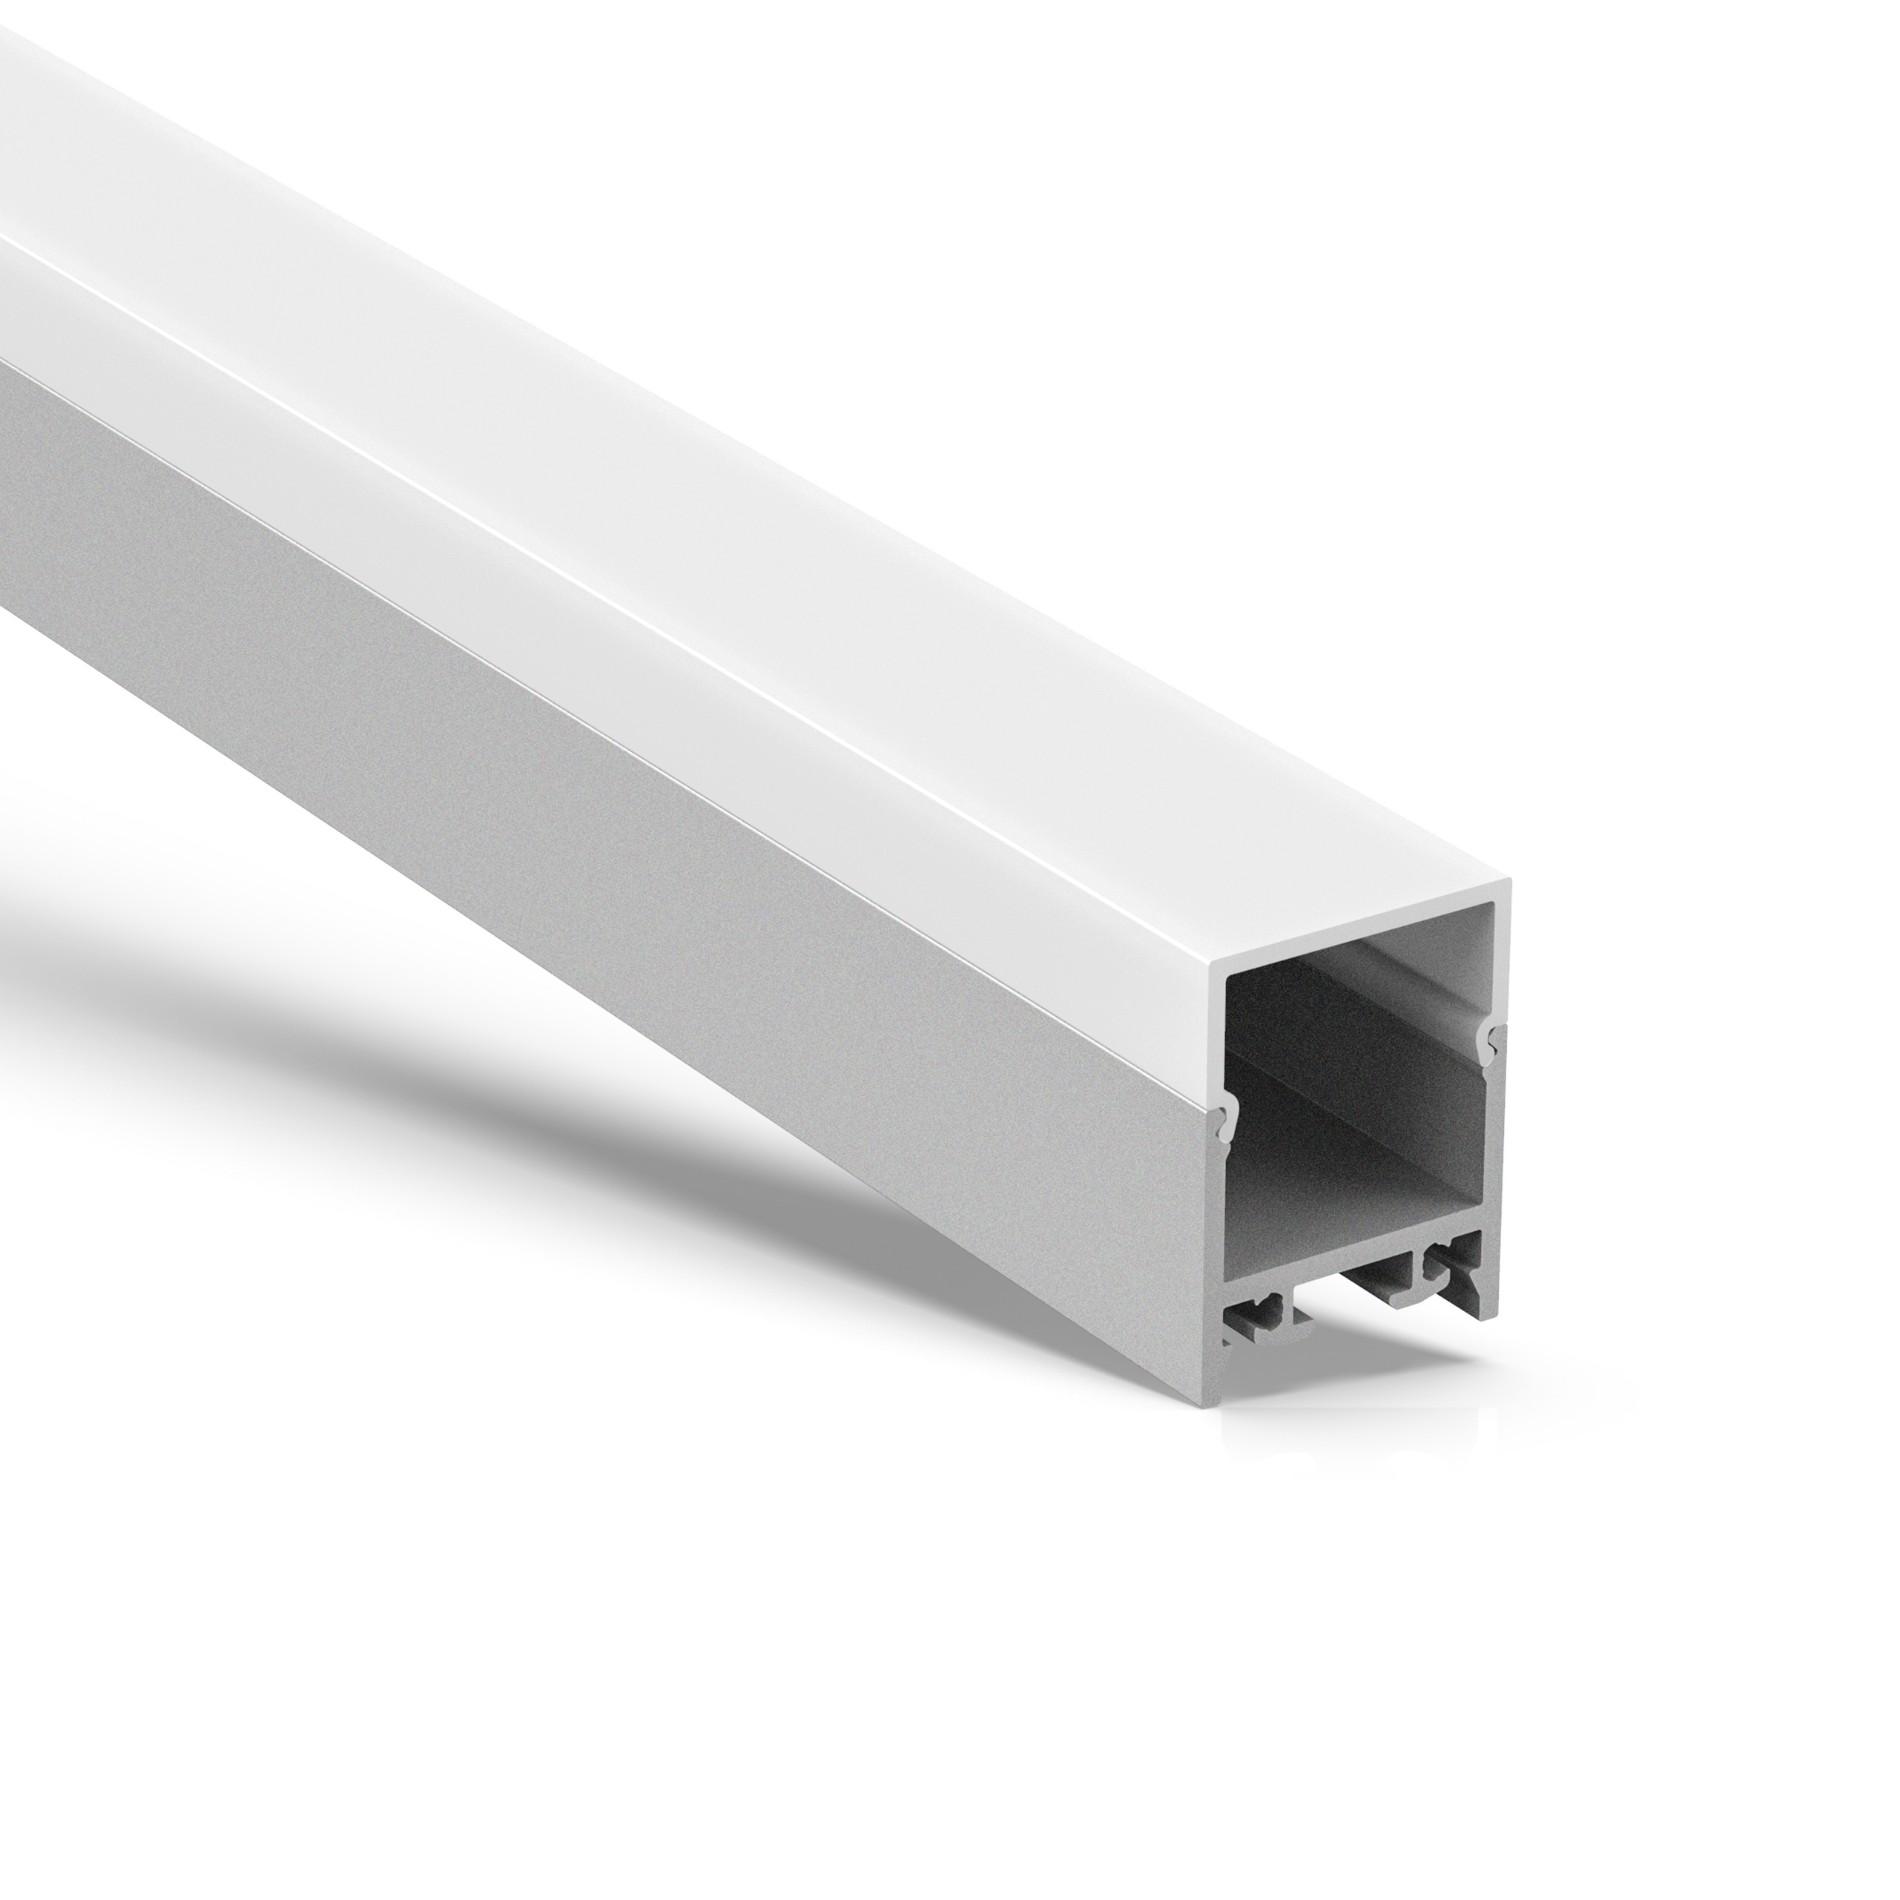 Perfil de aluminio LED colgante AT16-5